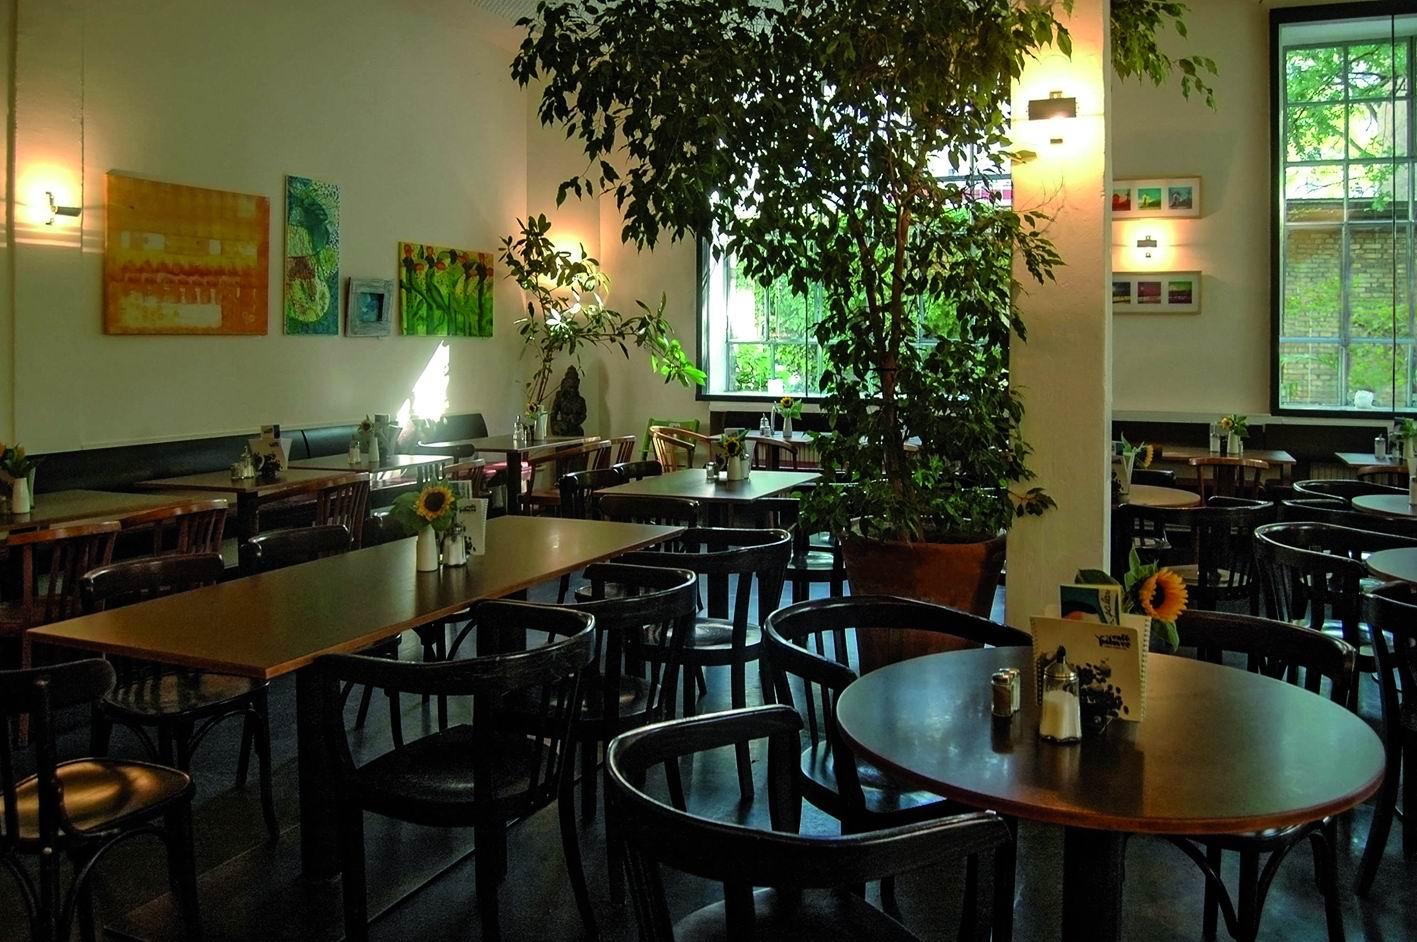 Bild: Café Palaver